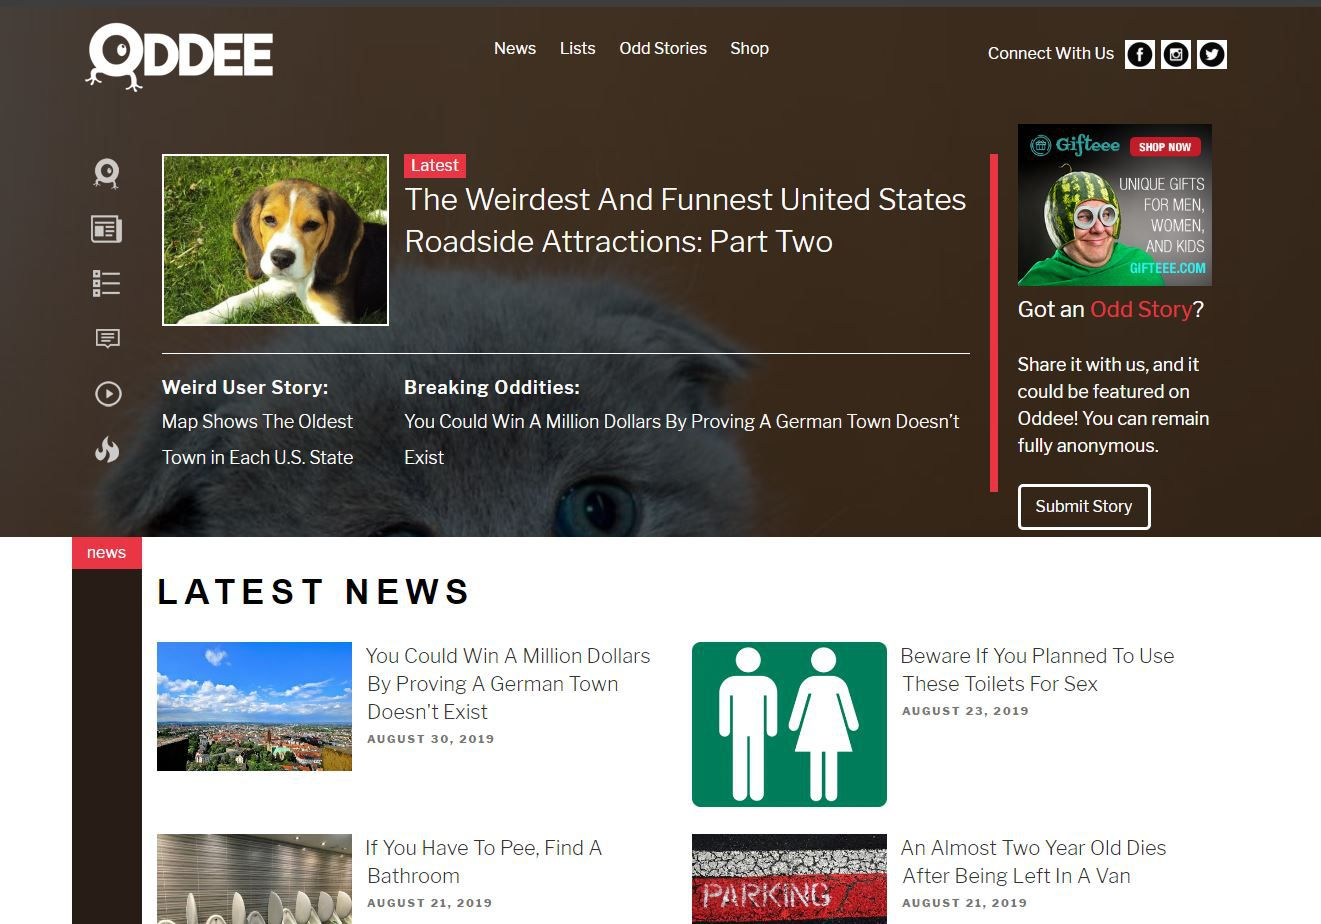 Oddee website